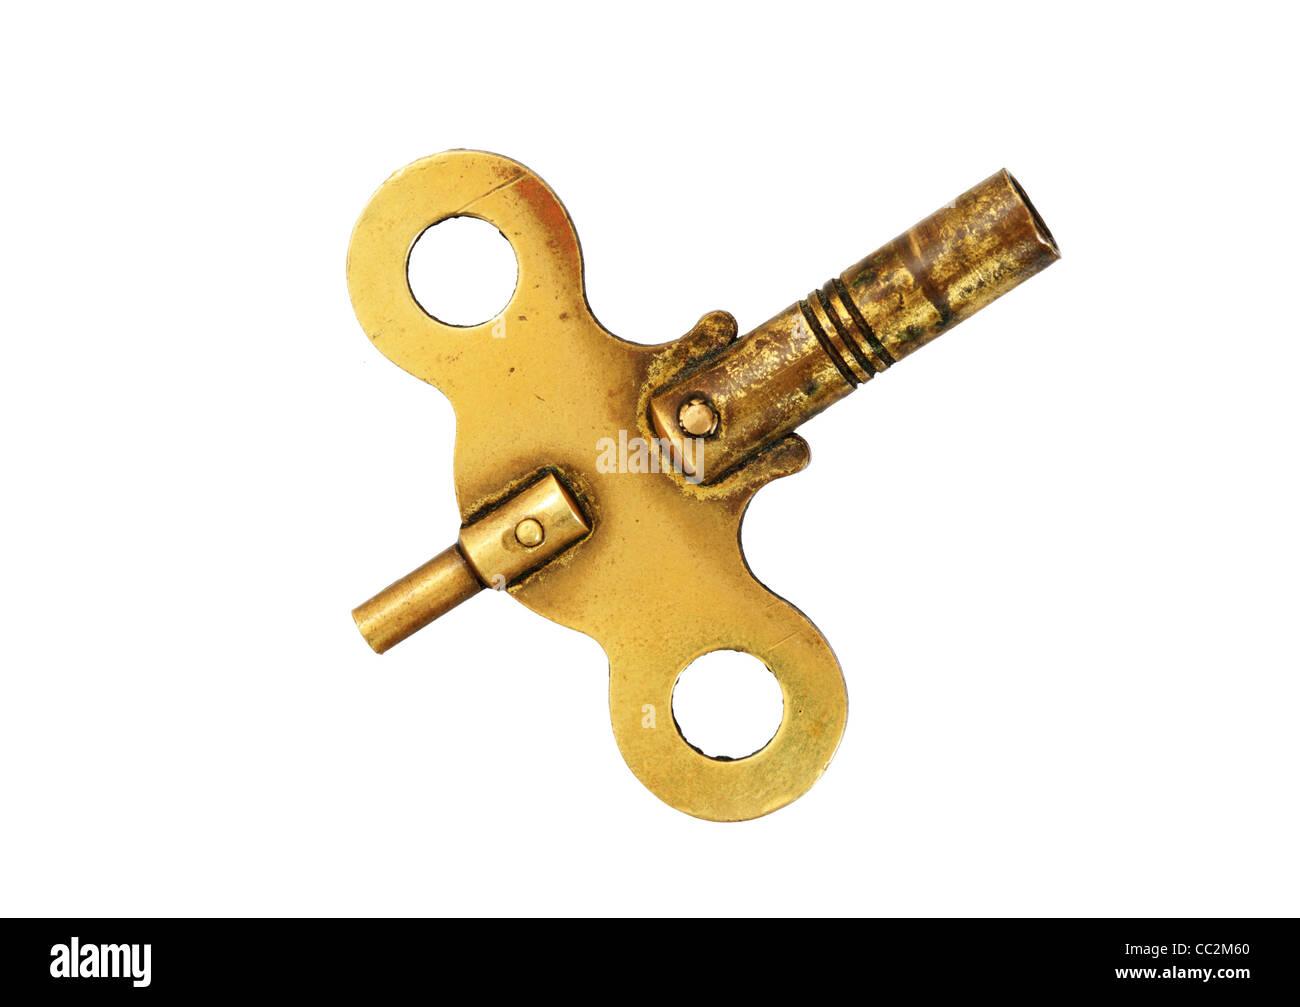 Latón Antiguo reloj clave de bobinado aislado sobre fondo blanco. Imagen De Stock